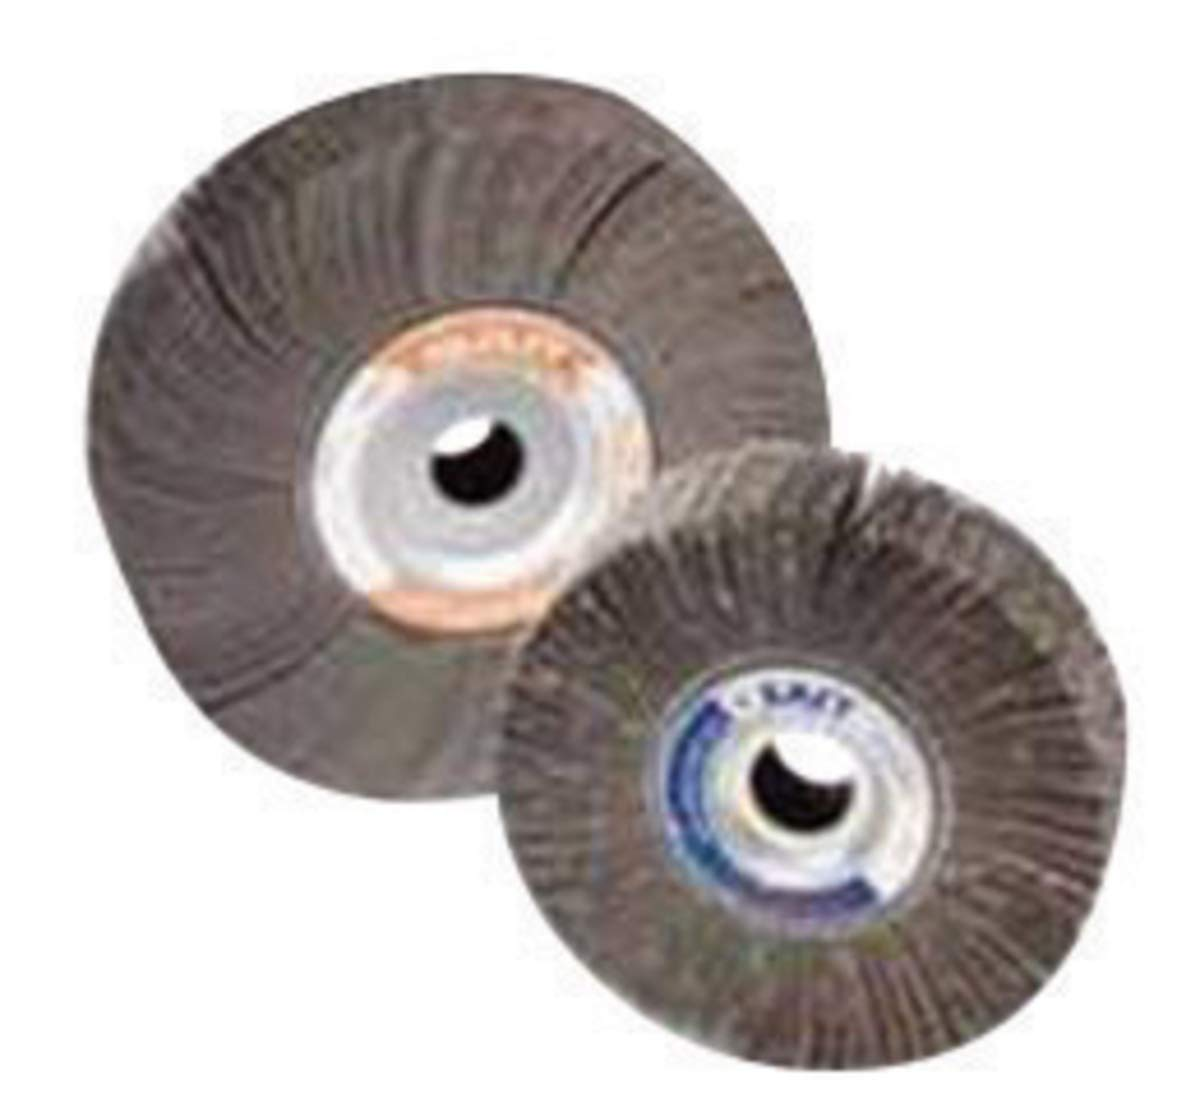 United Abrasives 6'' X 2'' X 1'' 60 Grit 2A Aluminum Oxide Large Coated Flap Wheel - 10 Each/Case